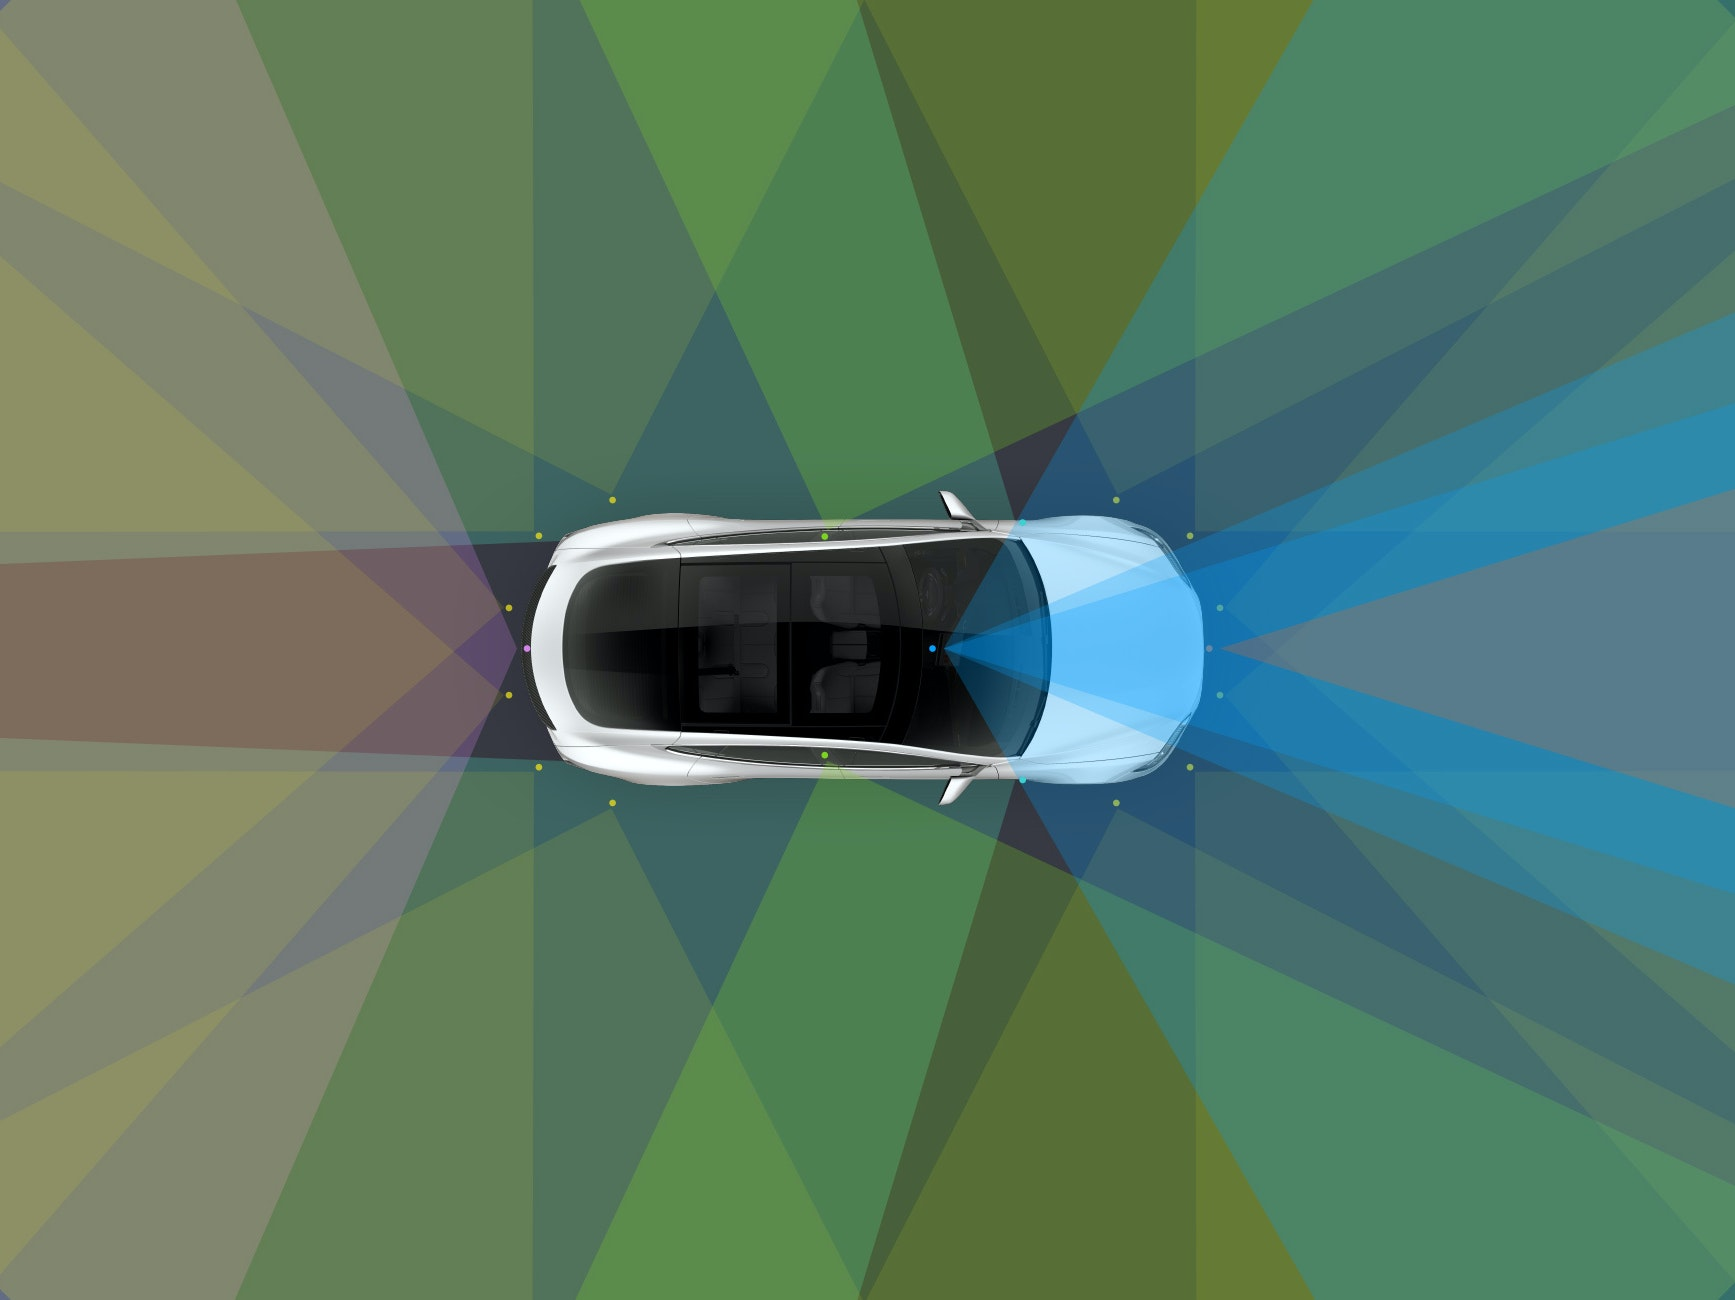 Elon Musk Confirms Cross-Country Autonomous Tesla Road Trips in 2017